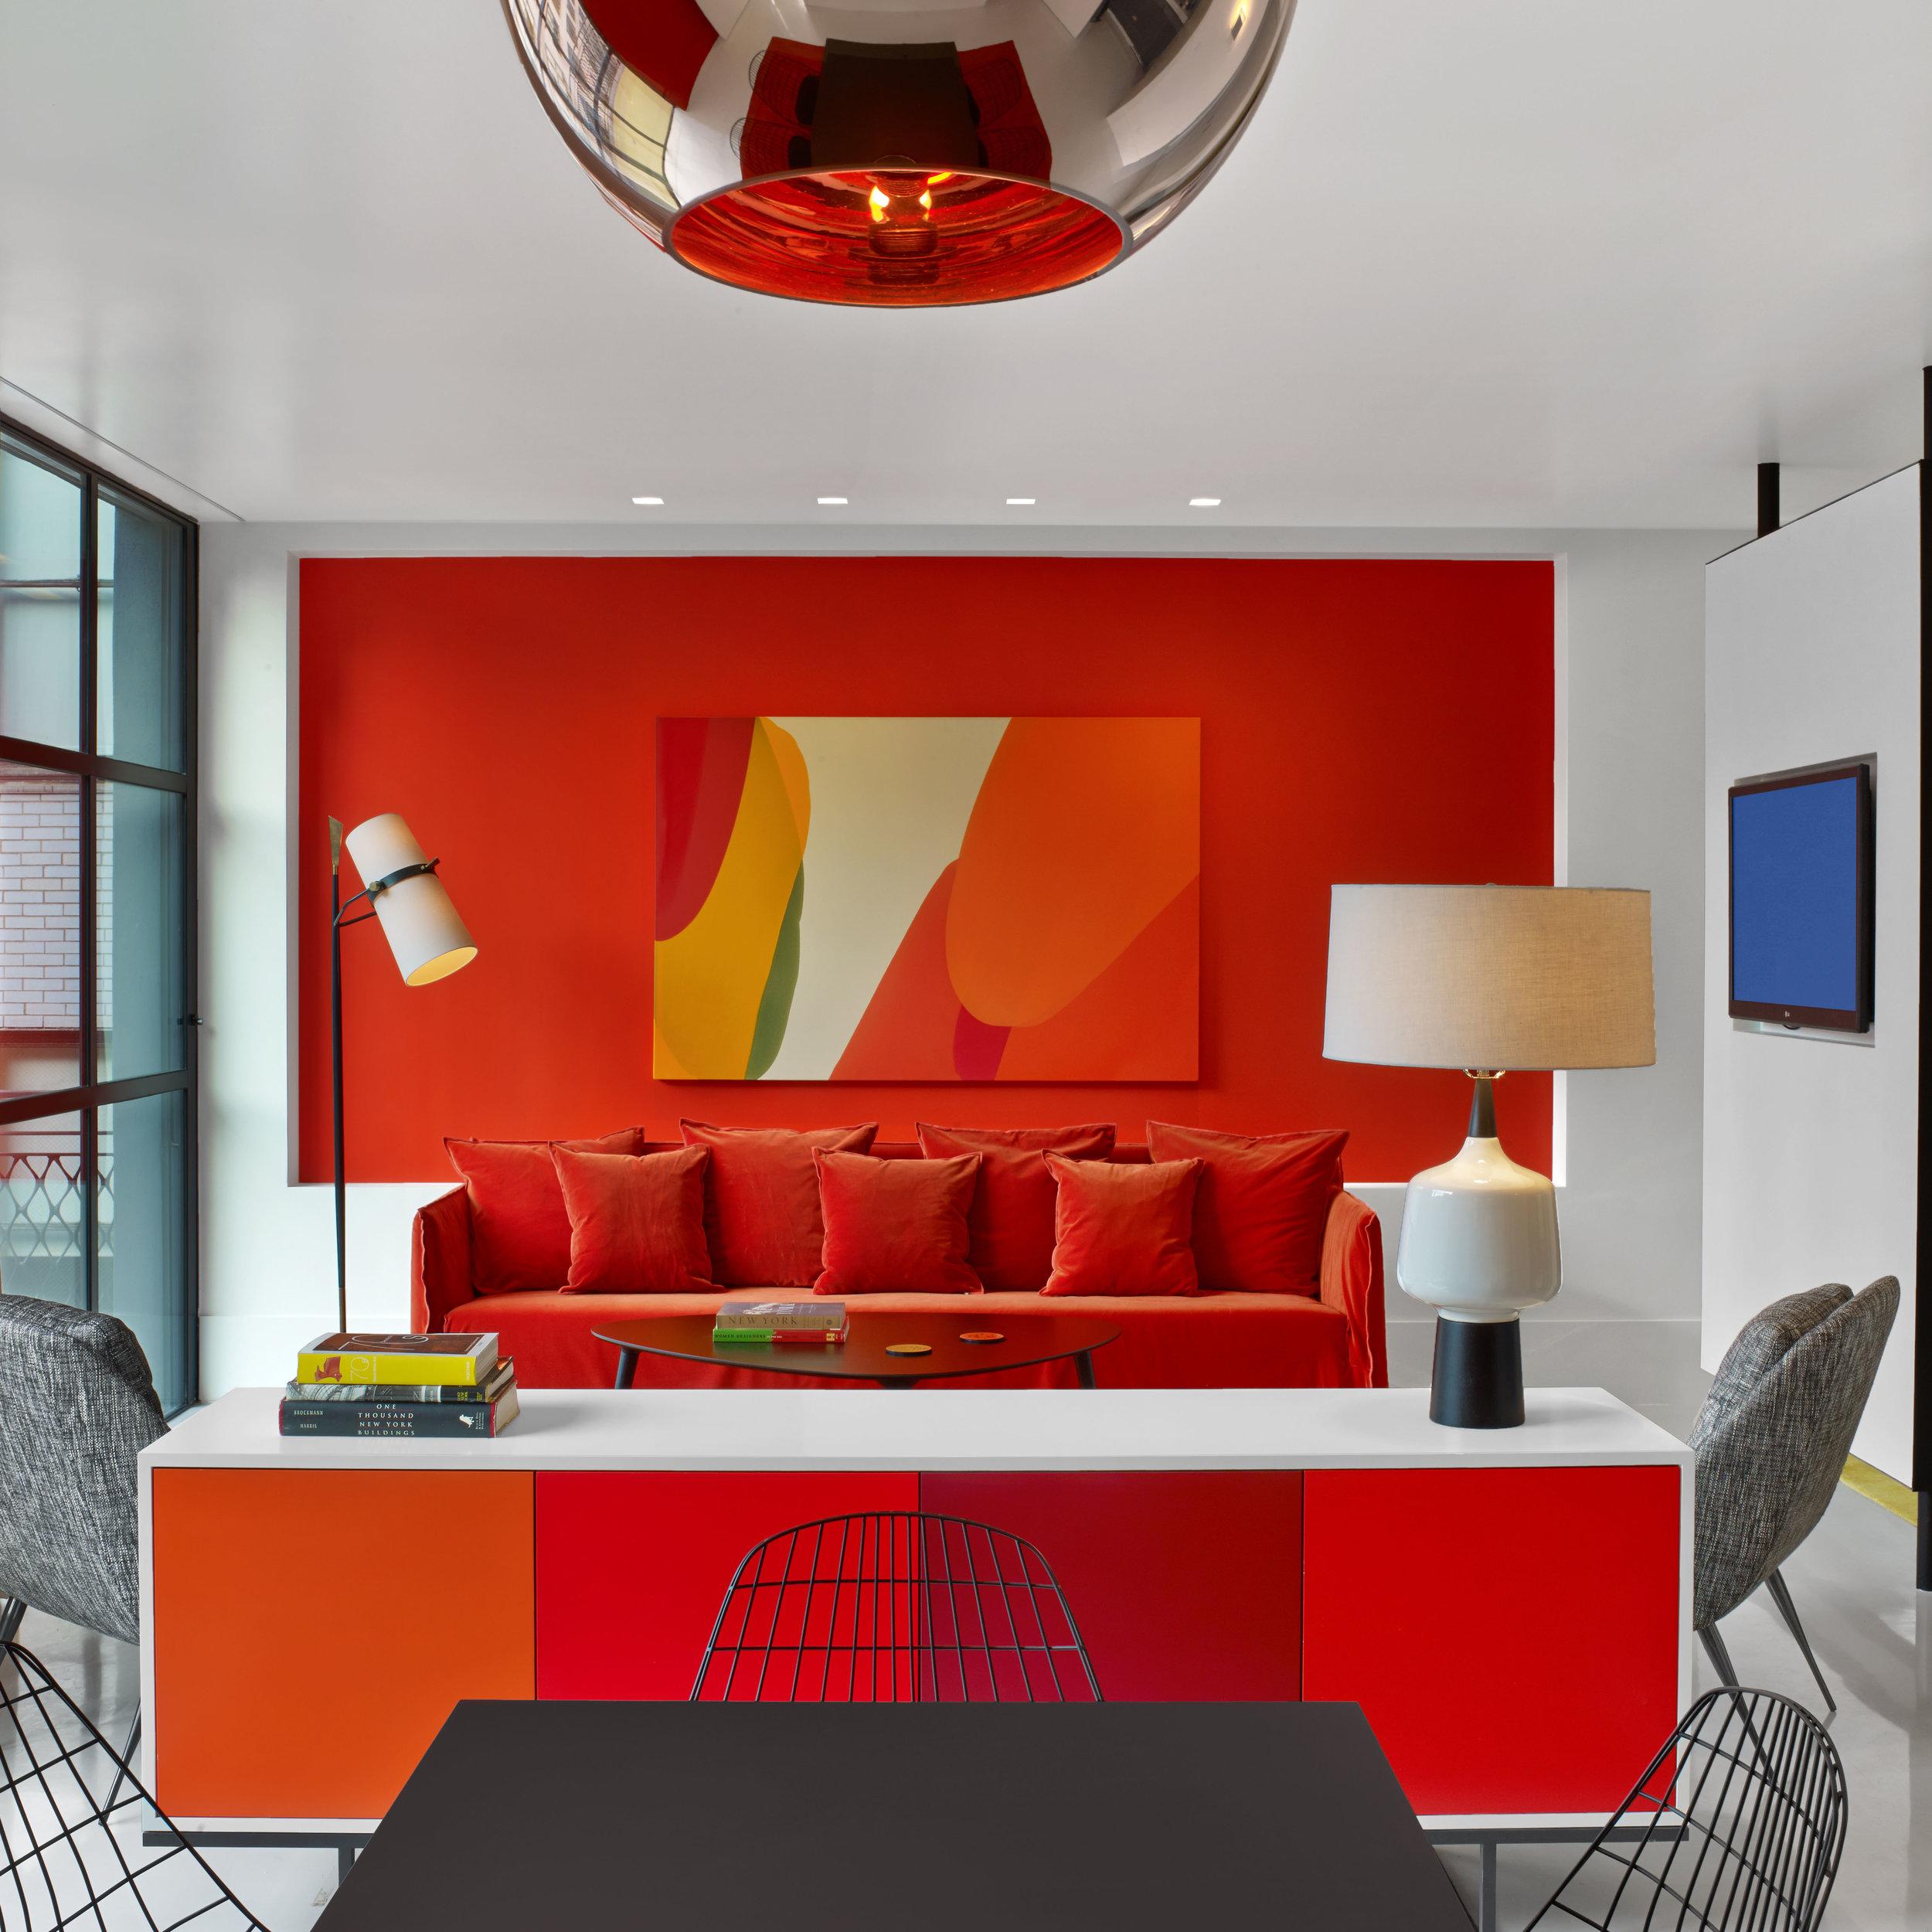 The William Hotel NYC Dec22 2013  (3).jpg